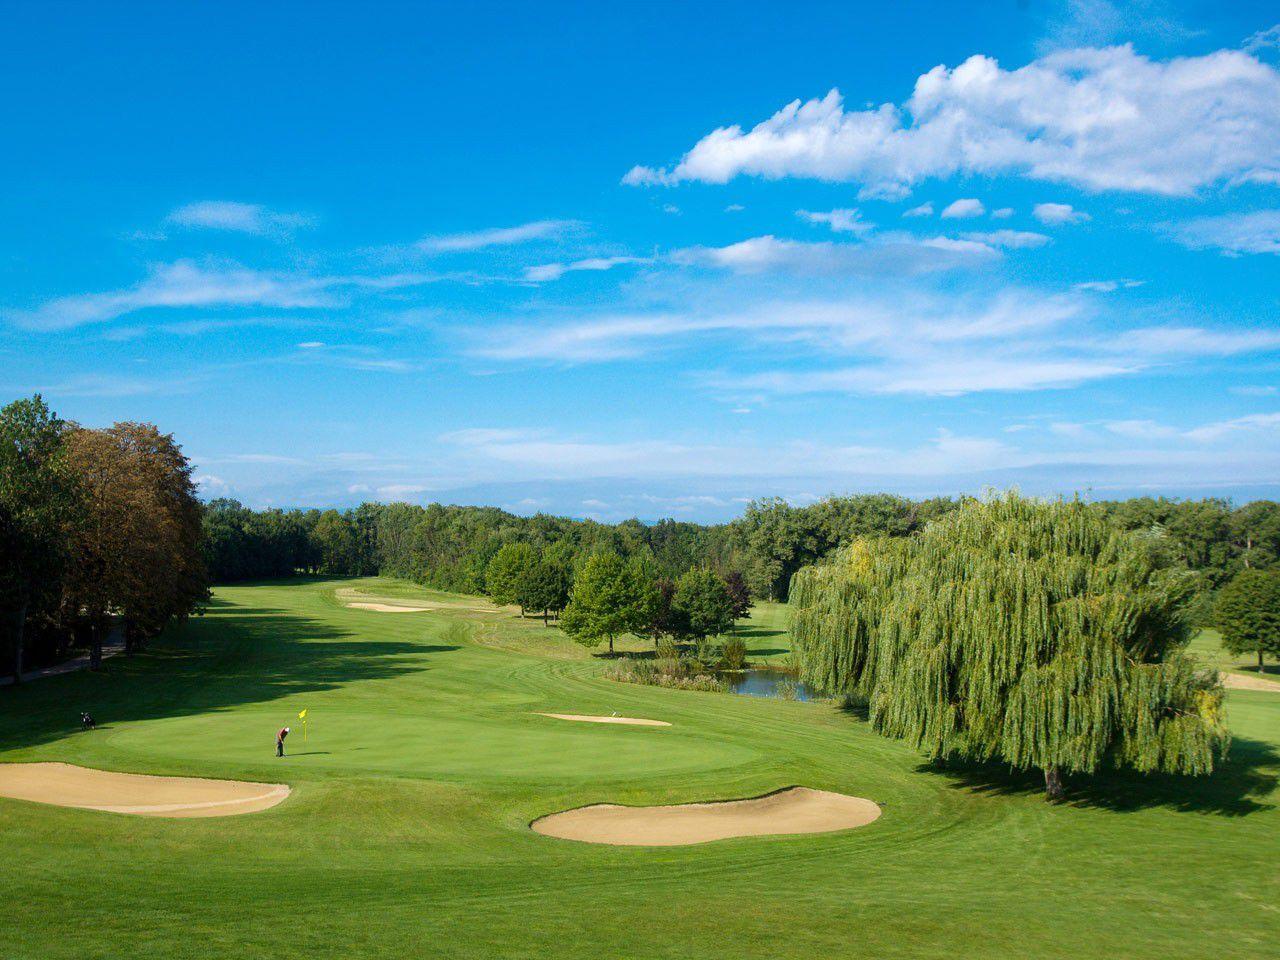 GolfClub schloss Ebreichsdorf, GolfClub Ebreichsdorf